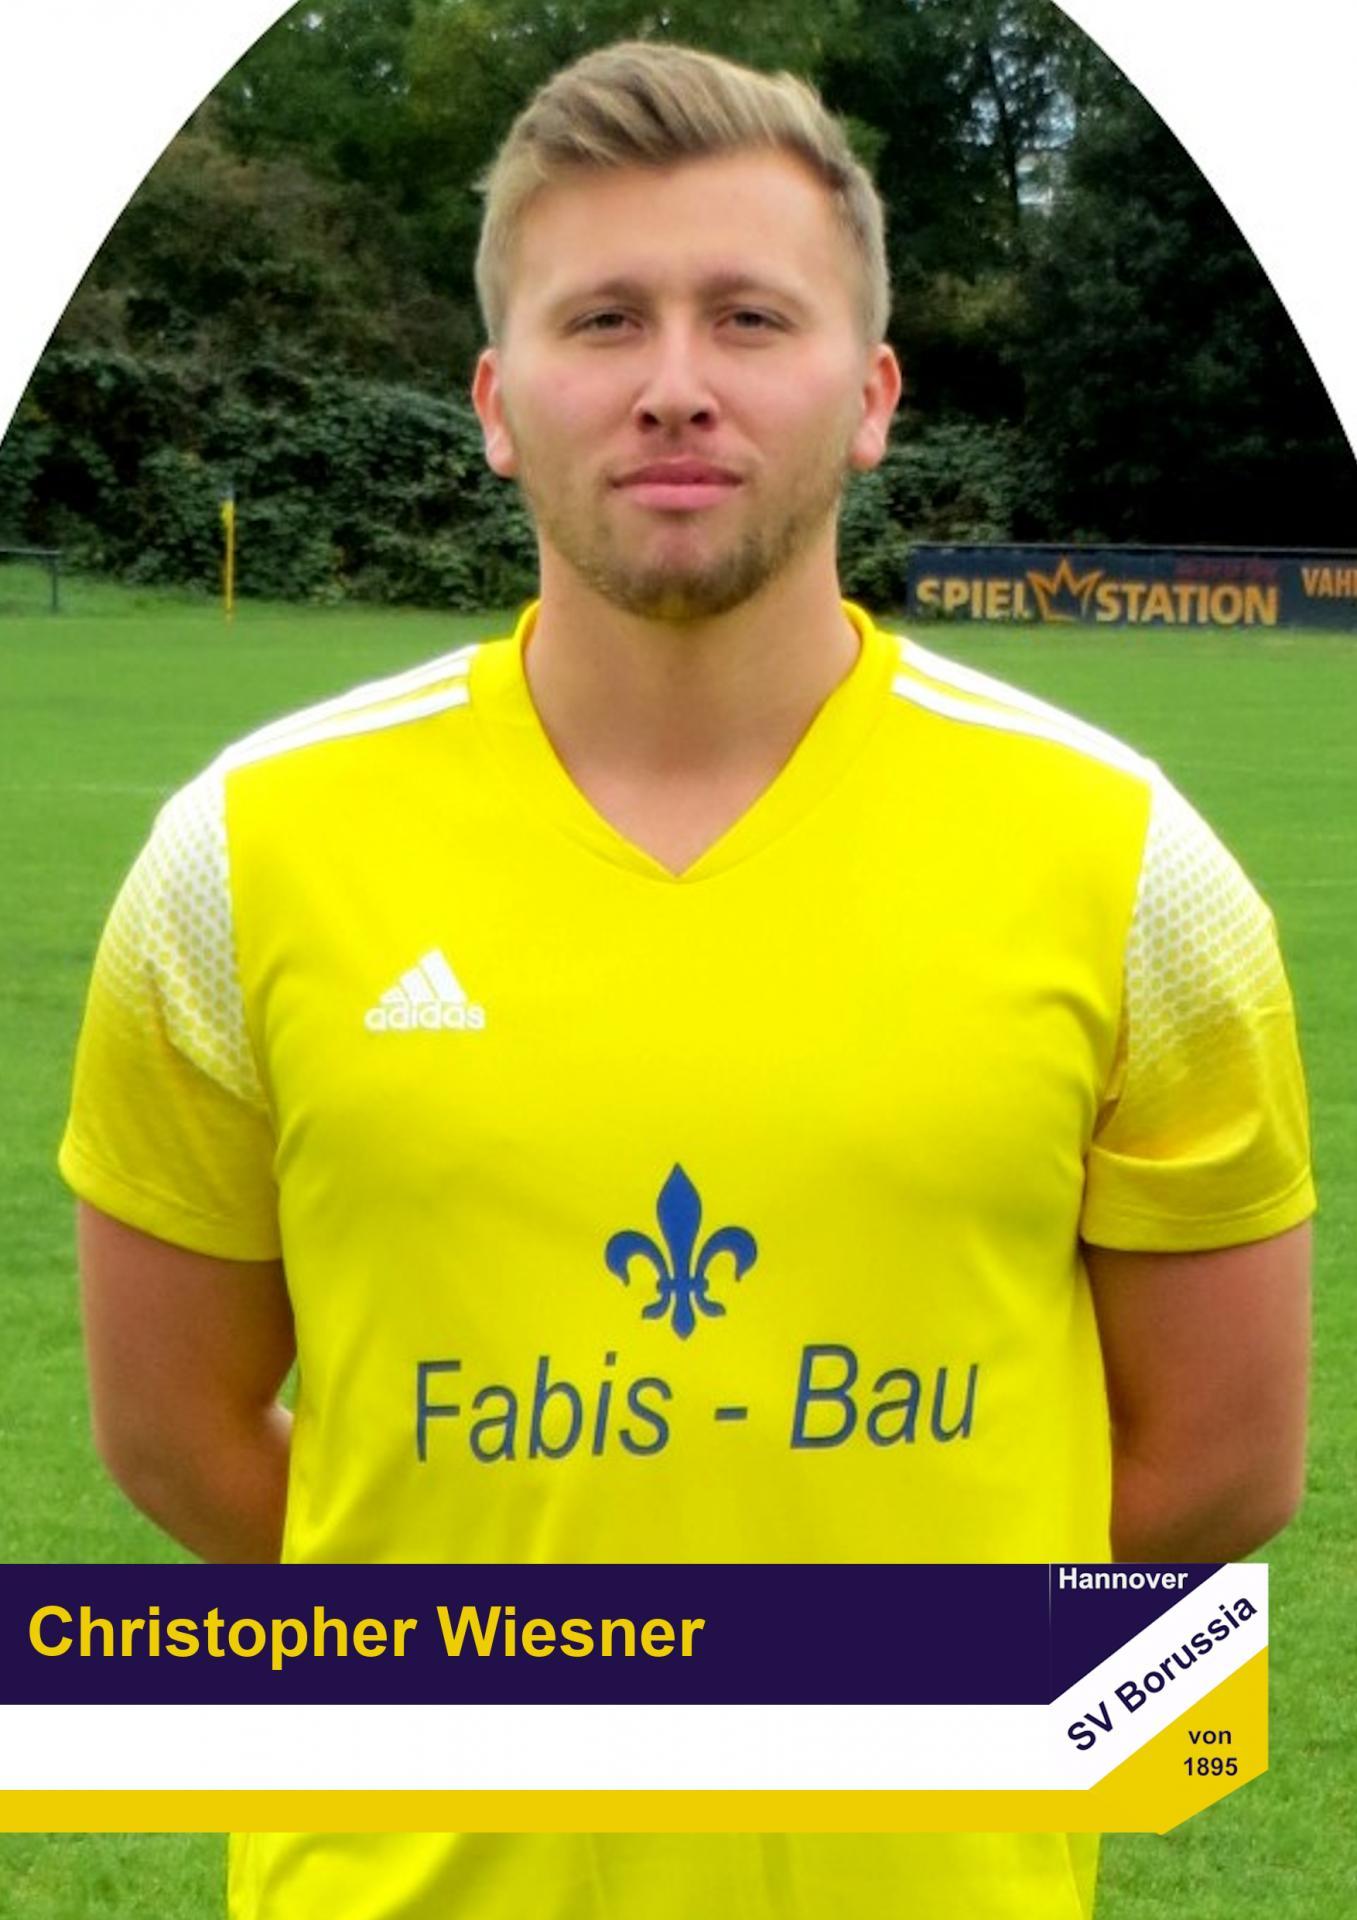 Christopher Wiesner